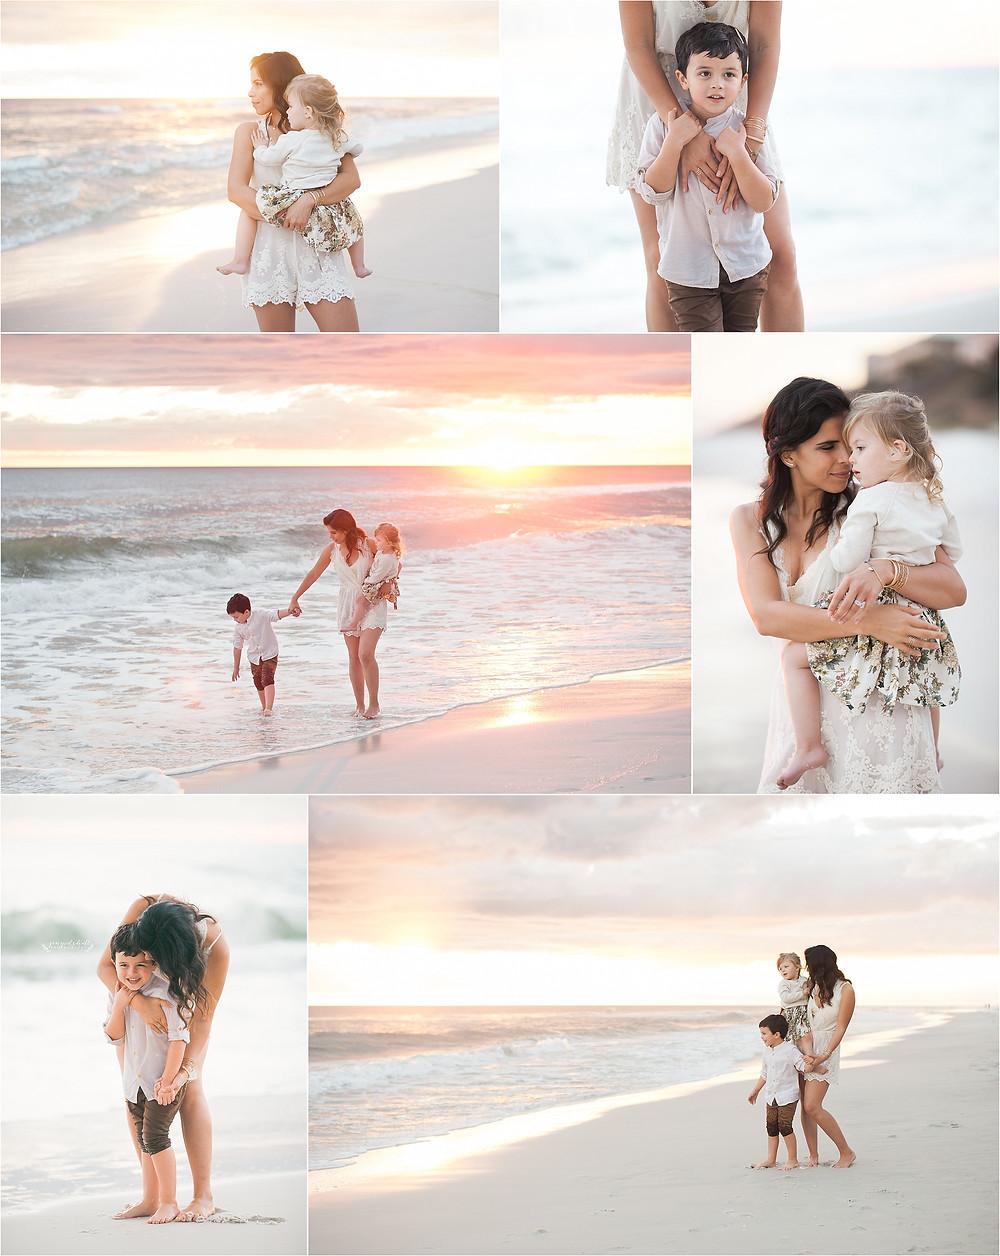 Lacher | Sarasota Family Photographer | Jen Godshall Photography